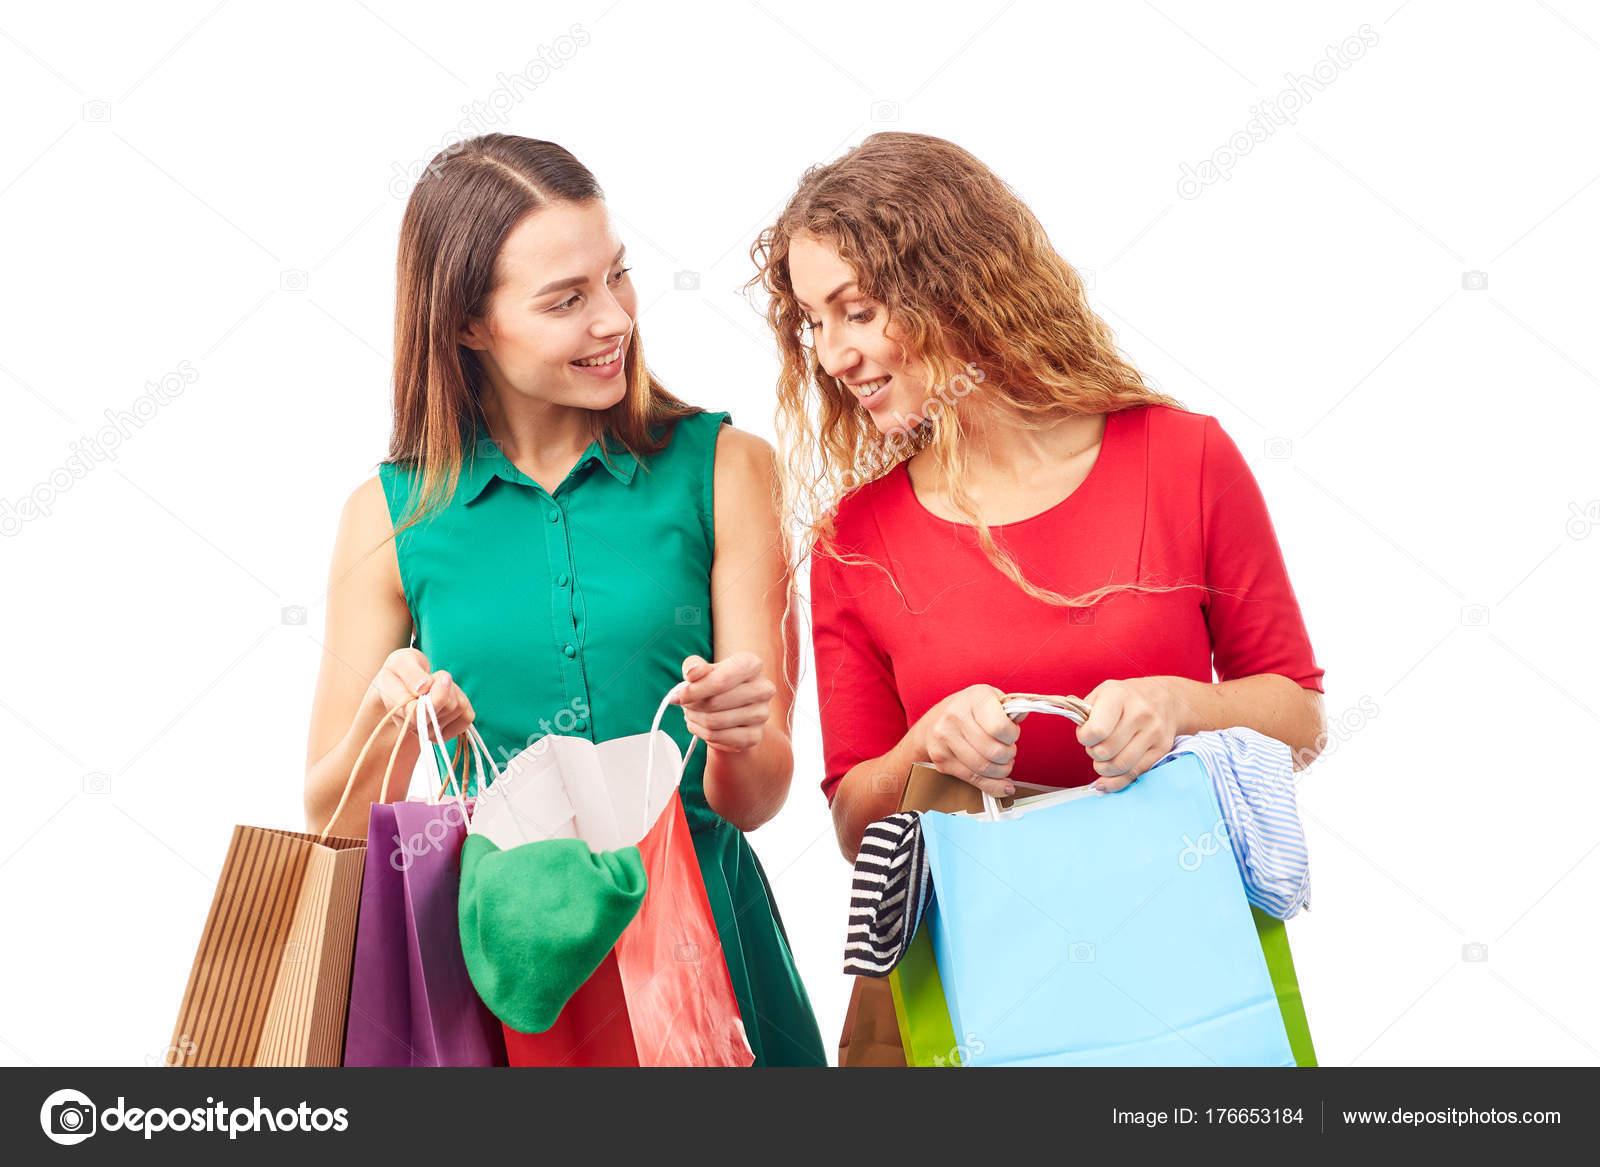 e53e3d6dc2c7 Πορτρέτο του δύο φίλες κρατώντας πολύχρωμα τσάντες για ψώνια — Εικόνα από  ...